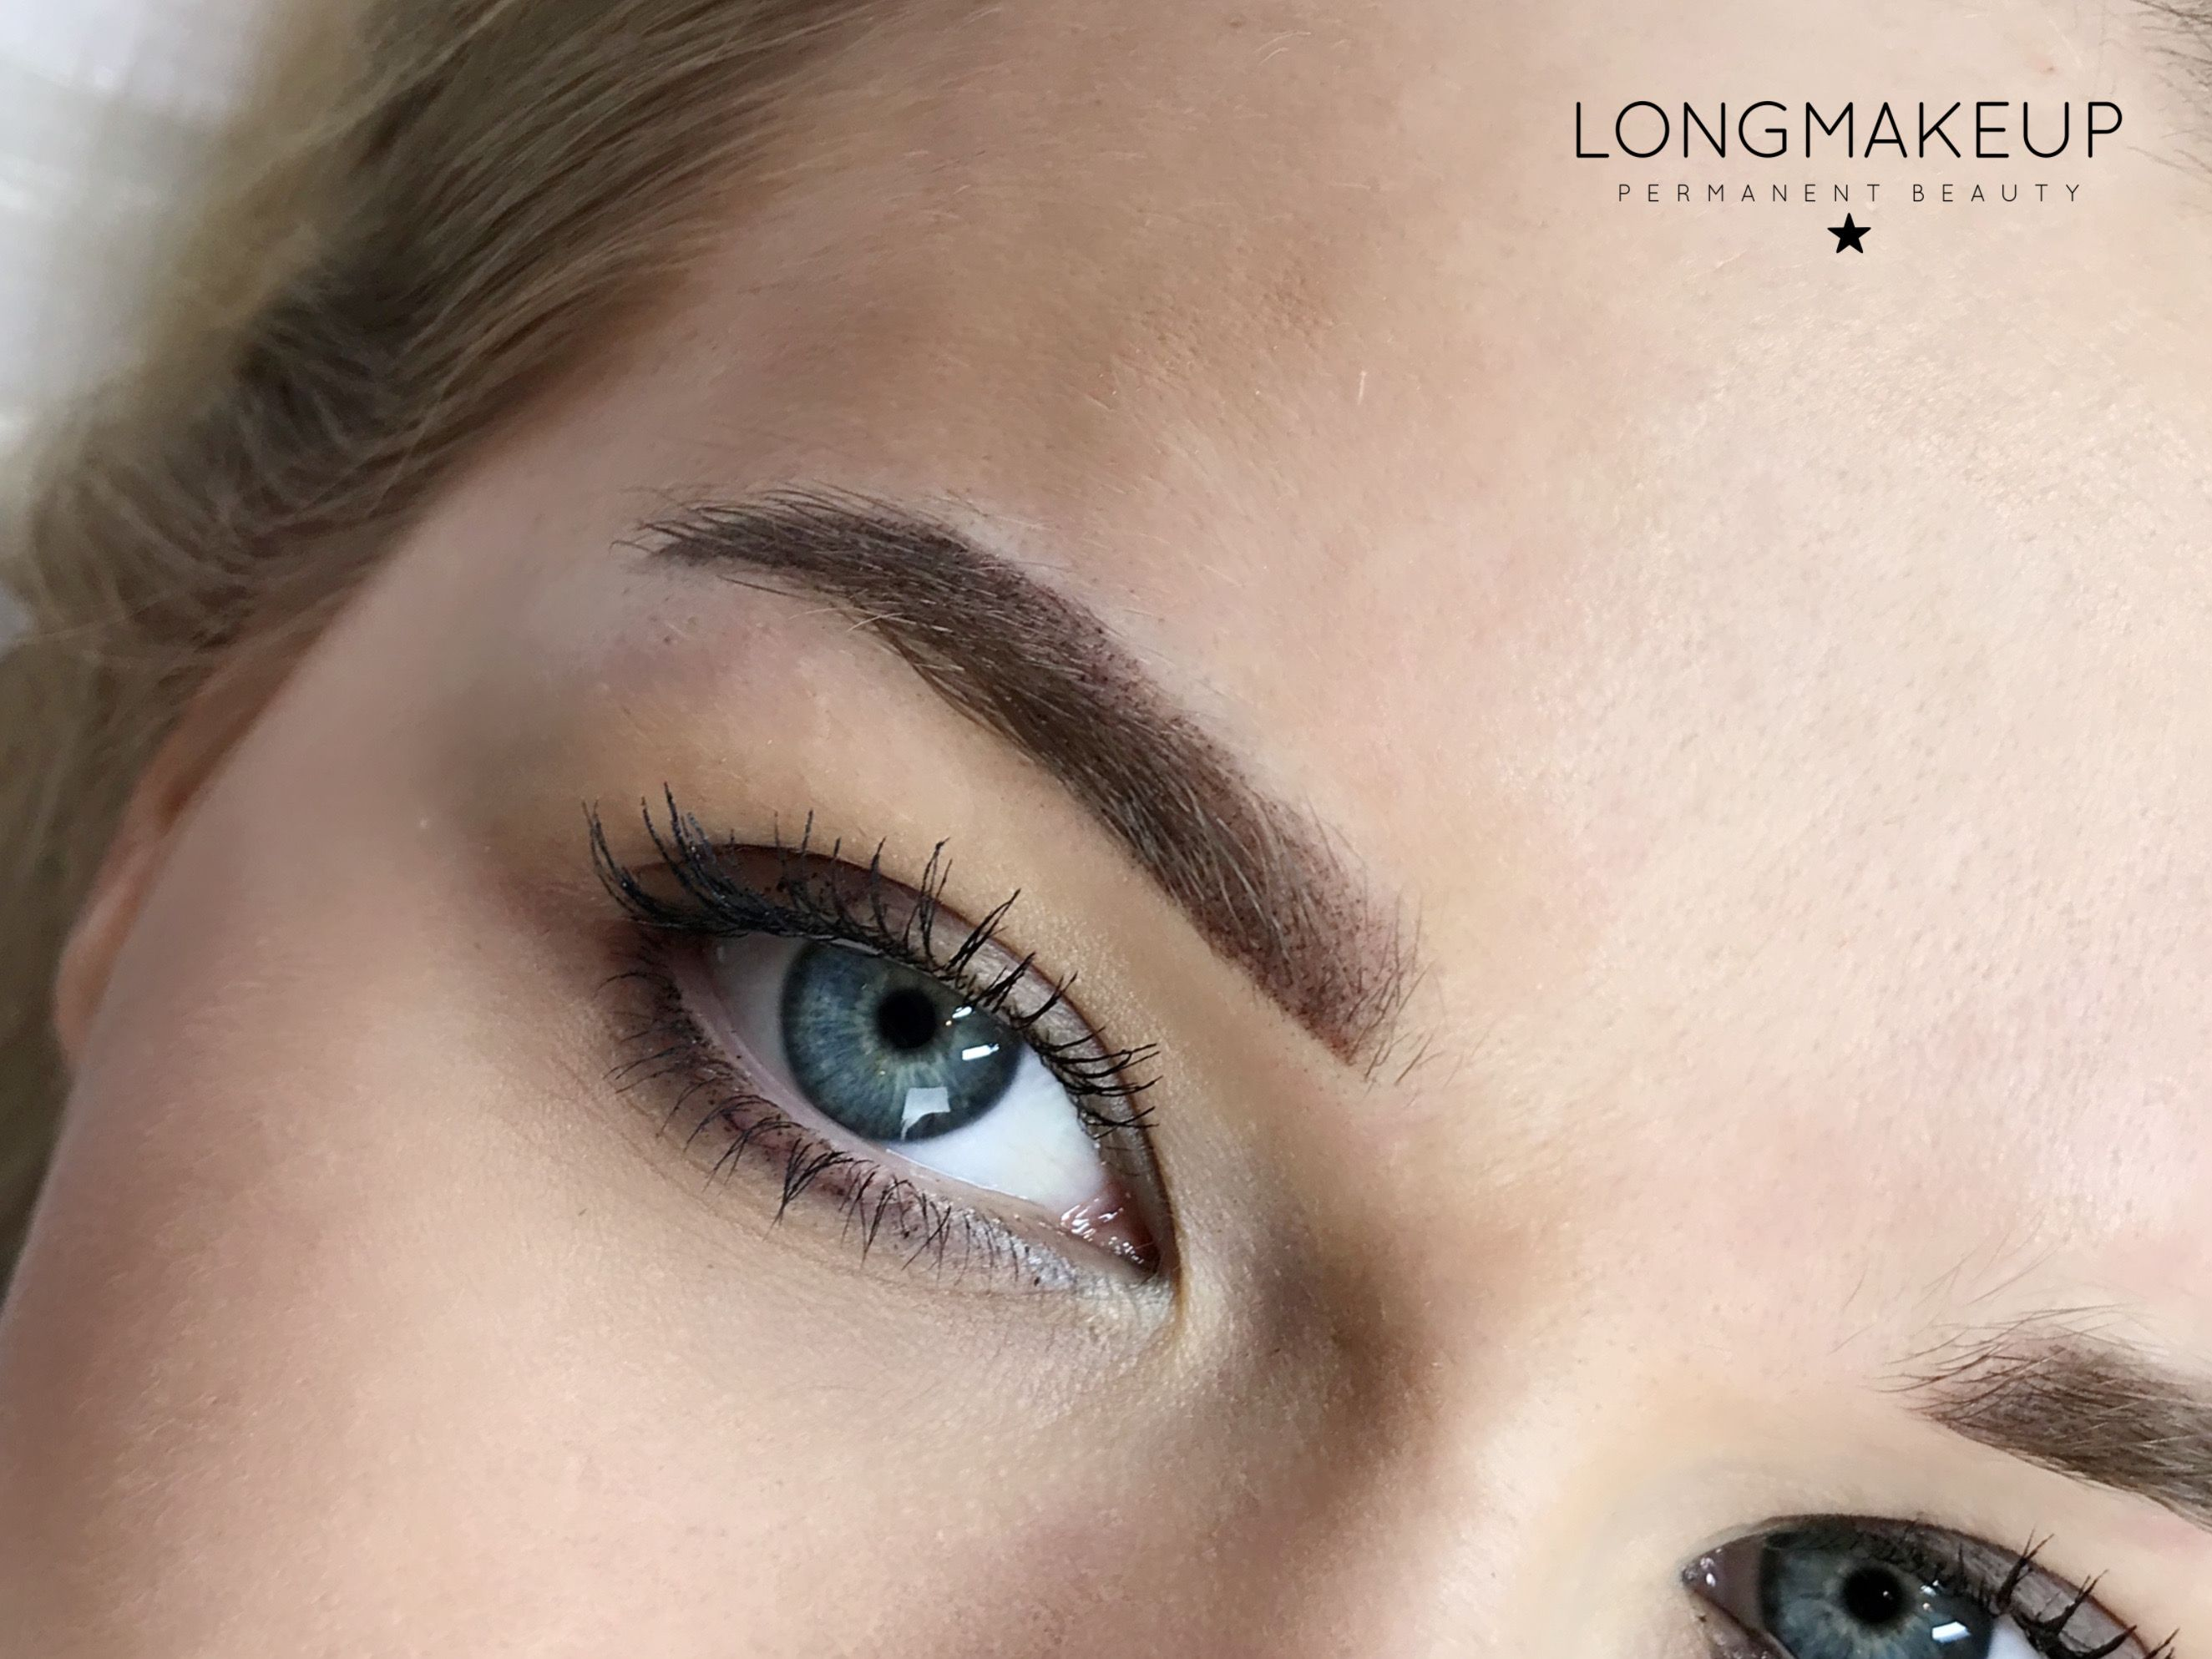 Permanent makeup eyebrow